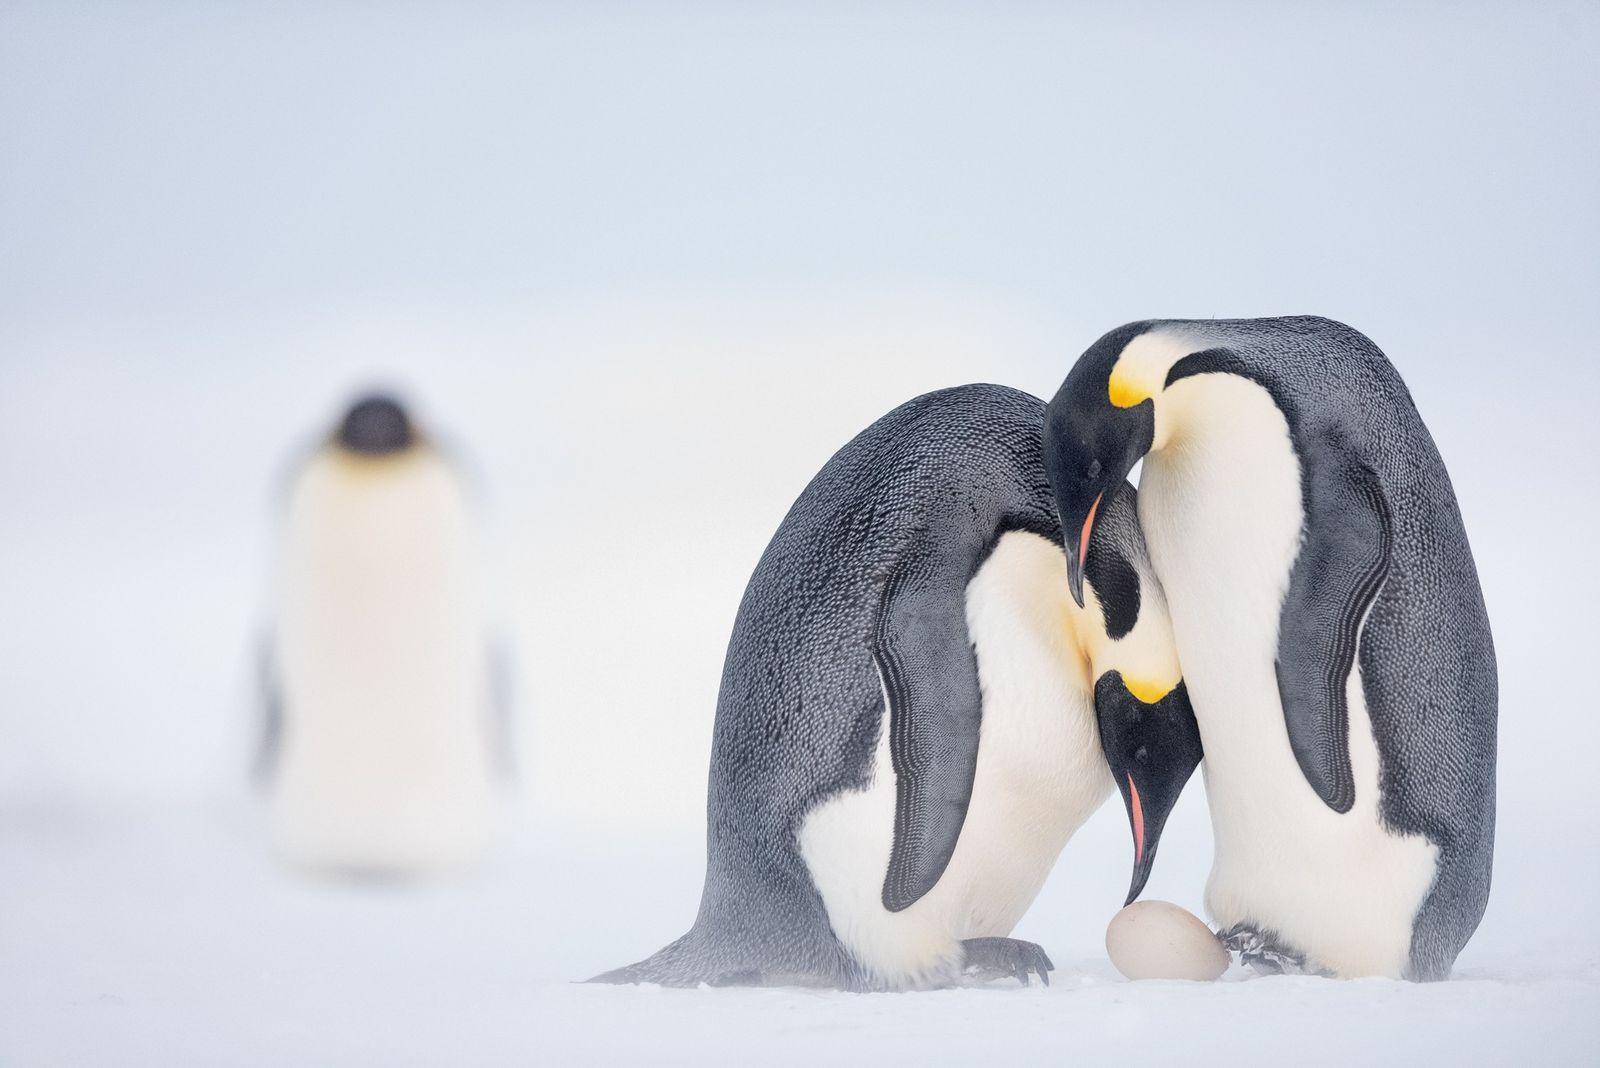 As ice melts, emperor penguins march toward extinction